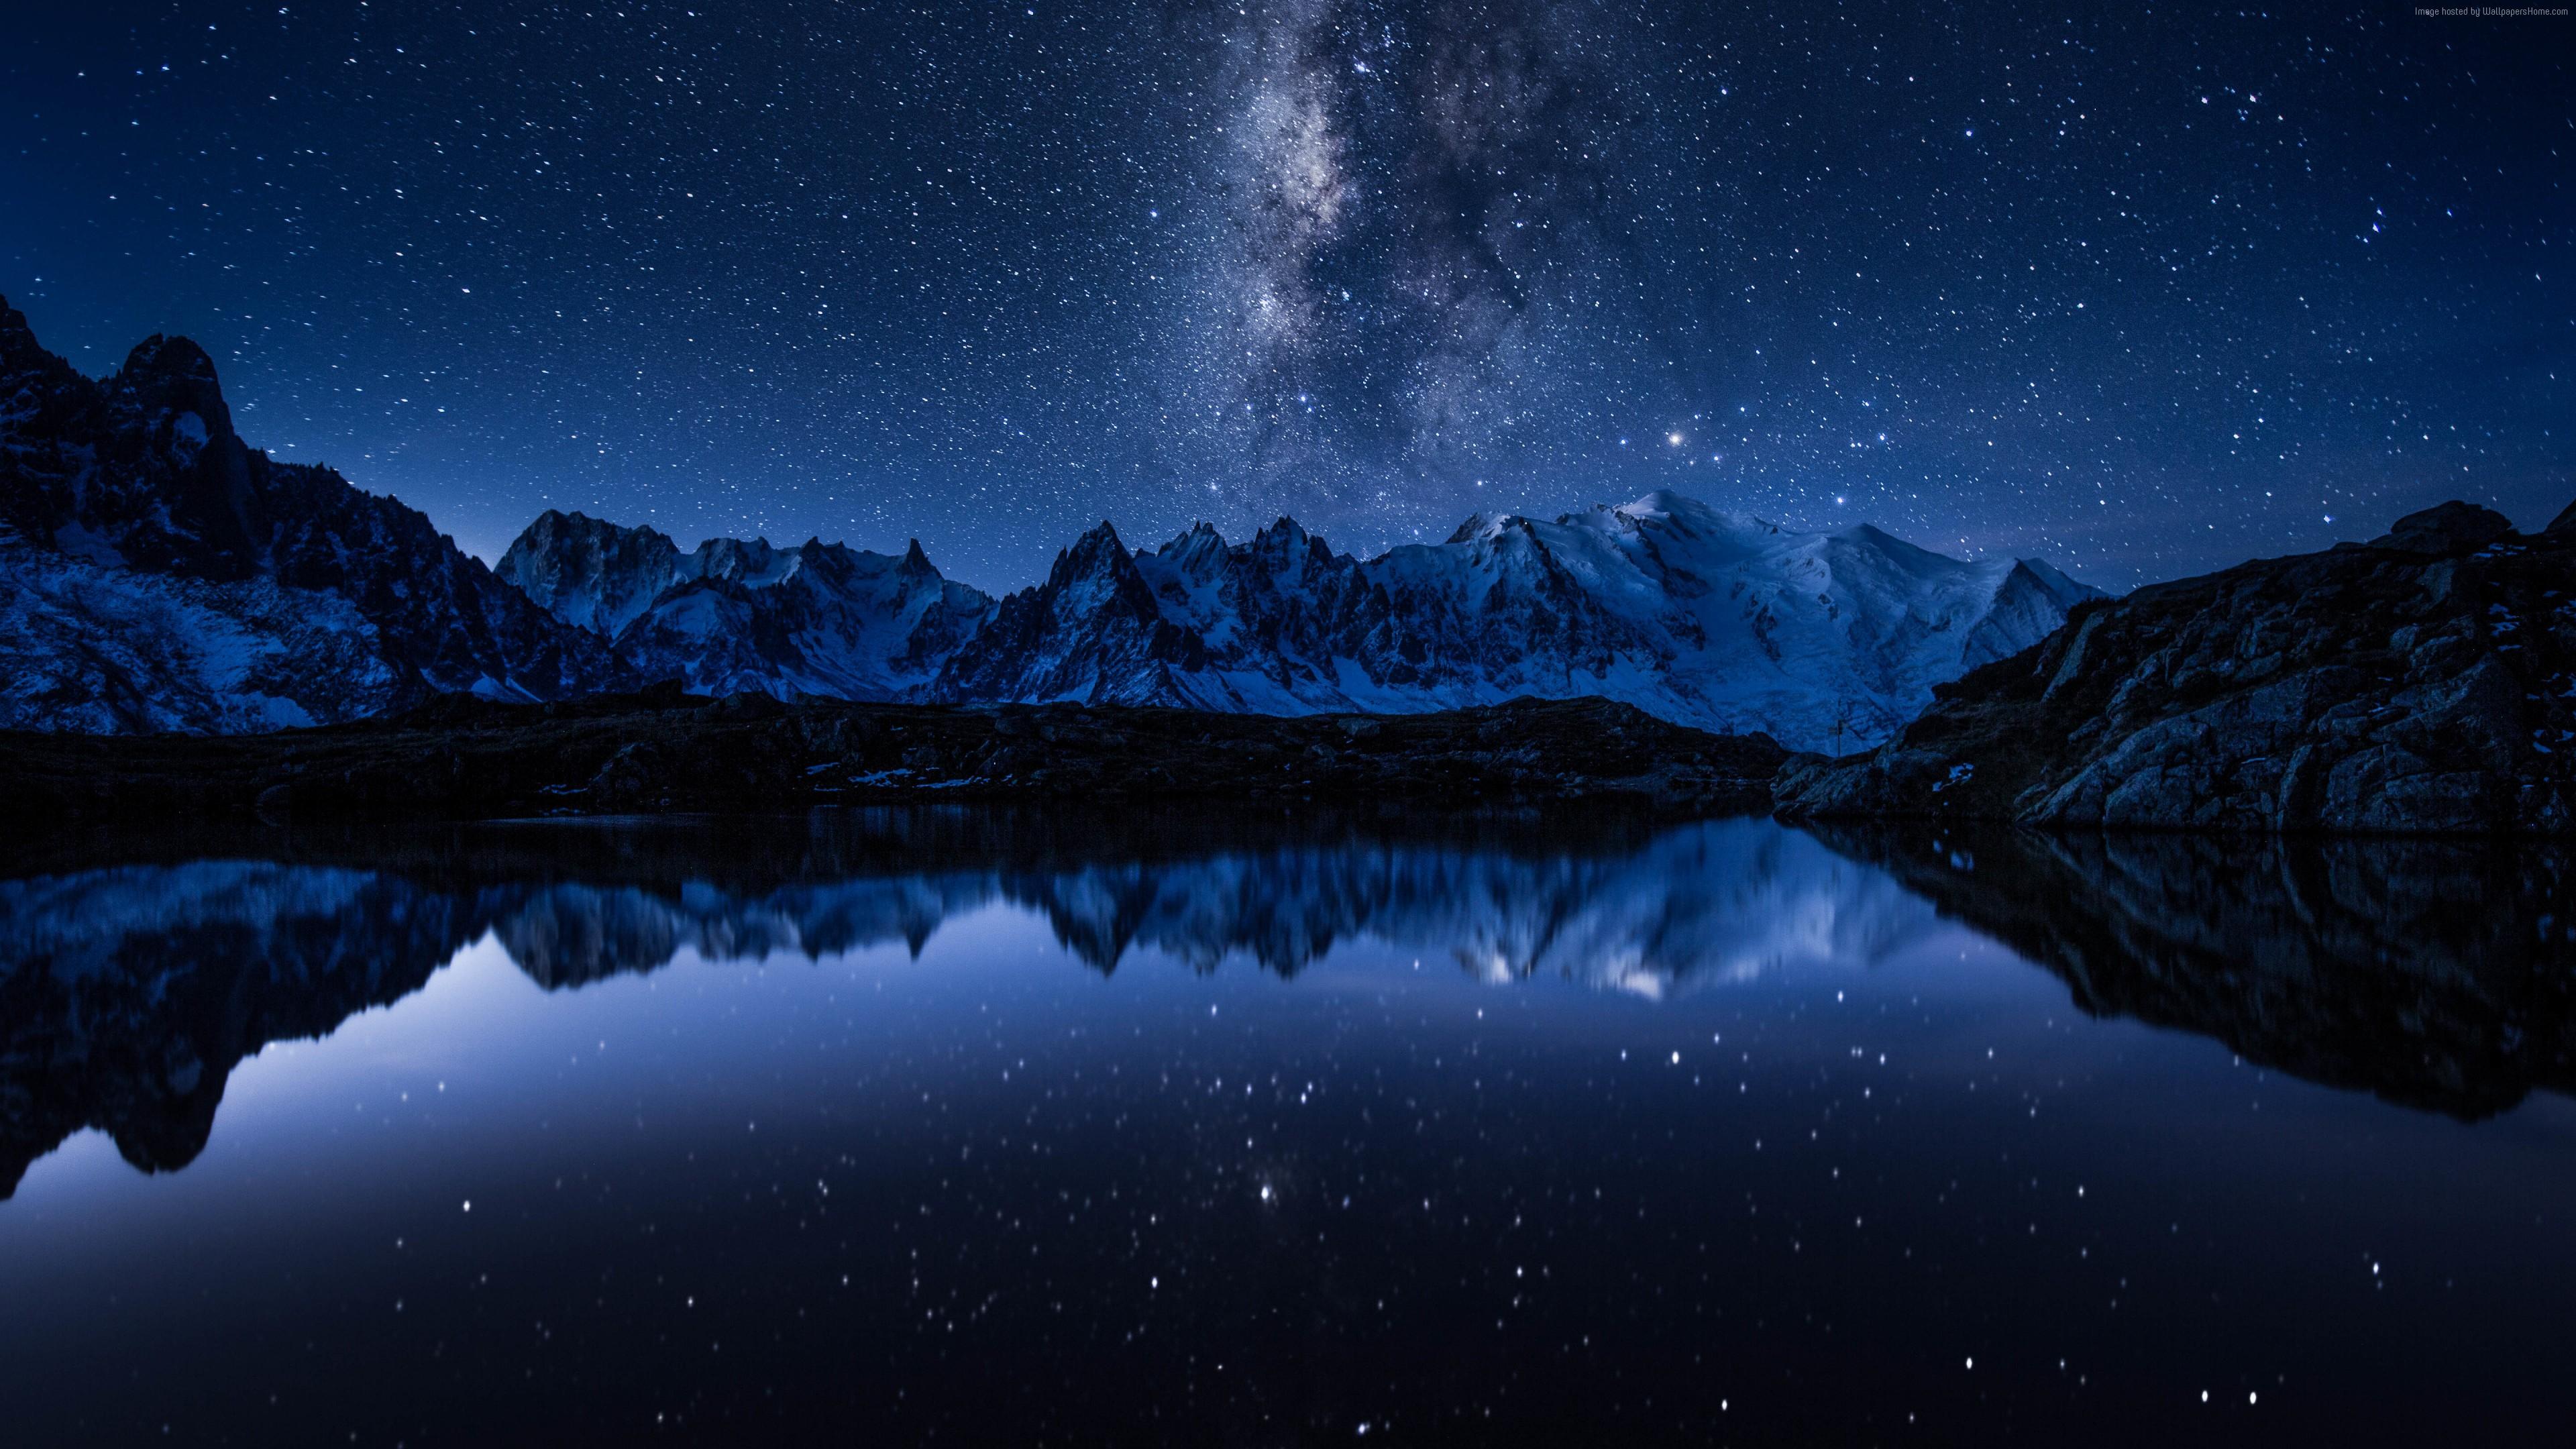 Wallpaper Stars Mountains Lake 5k Space Space Wallpaper 4k Pc 3840x2160 Wallpaper Teahub Io